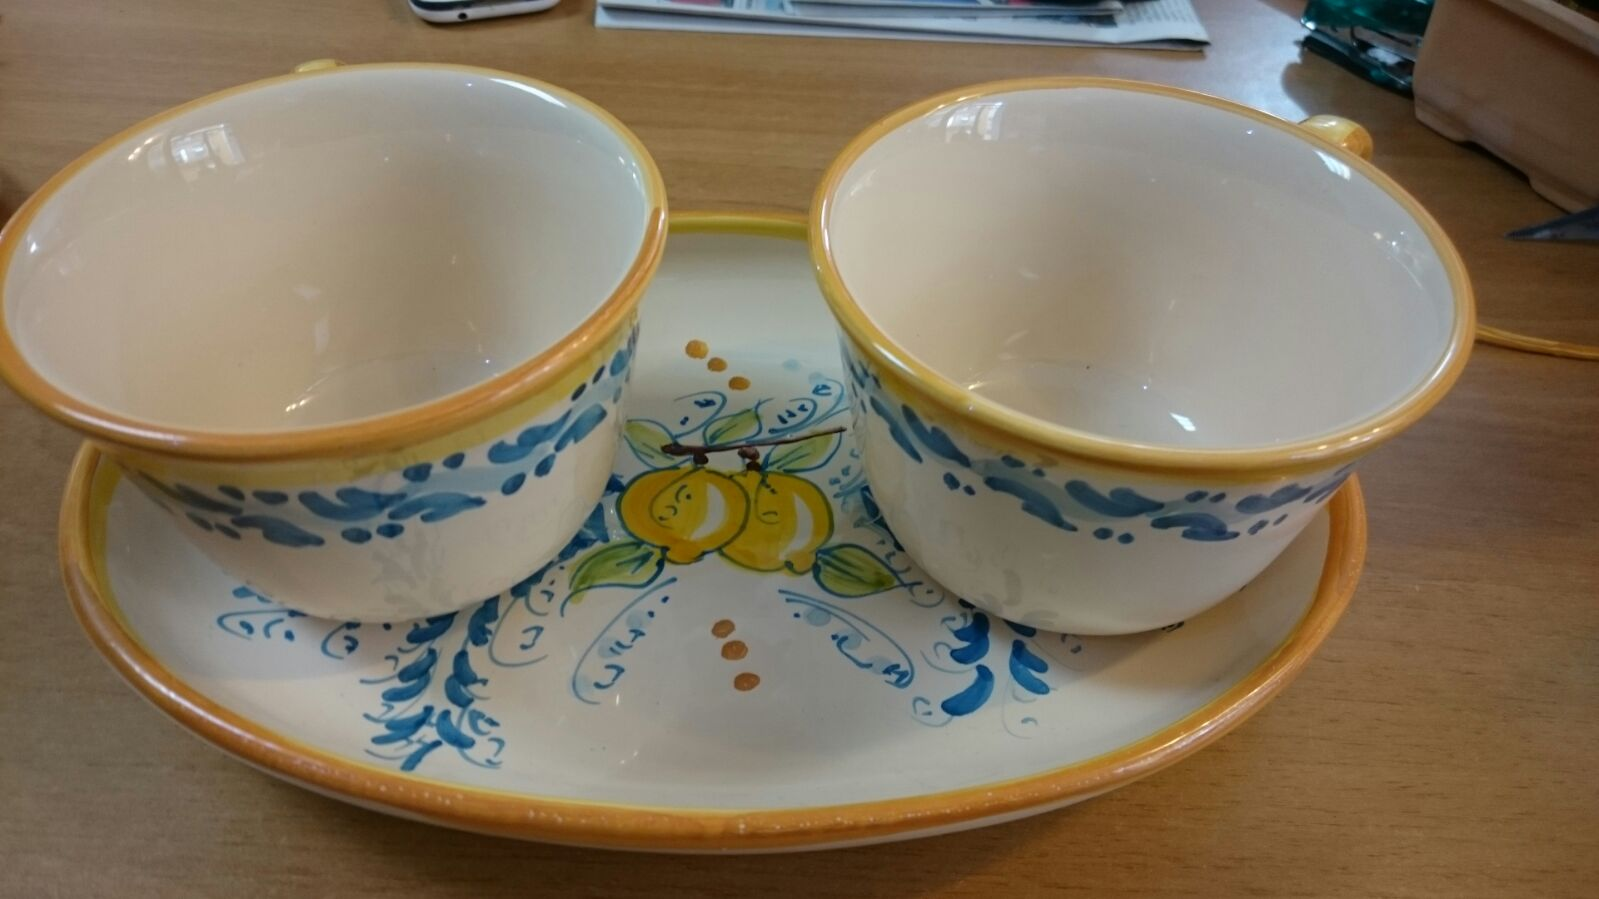 idee regalo in ceramica decorata siracusa